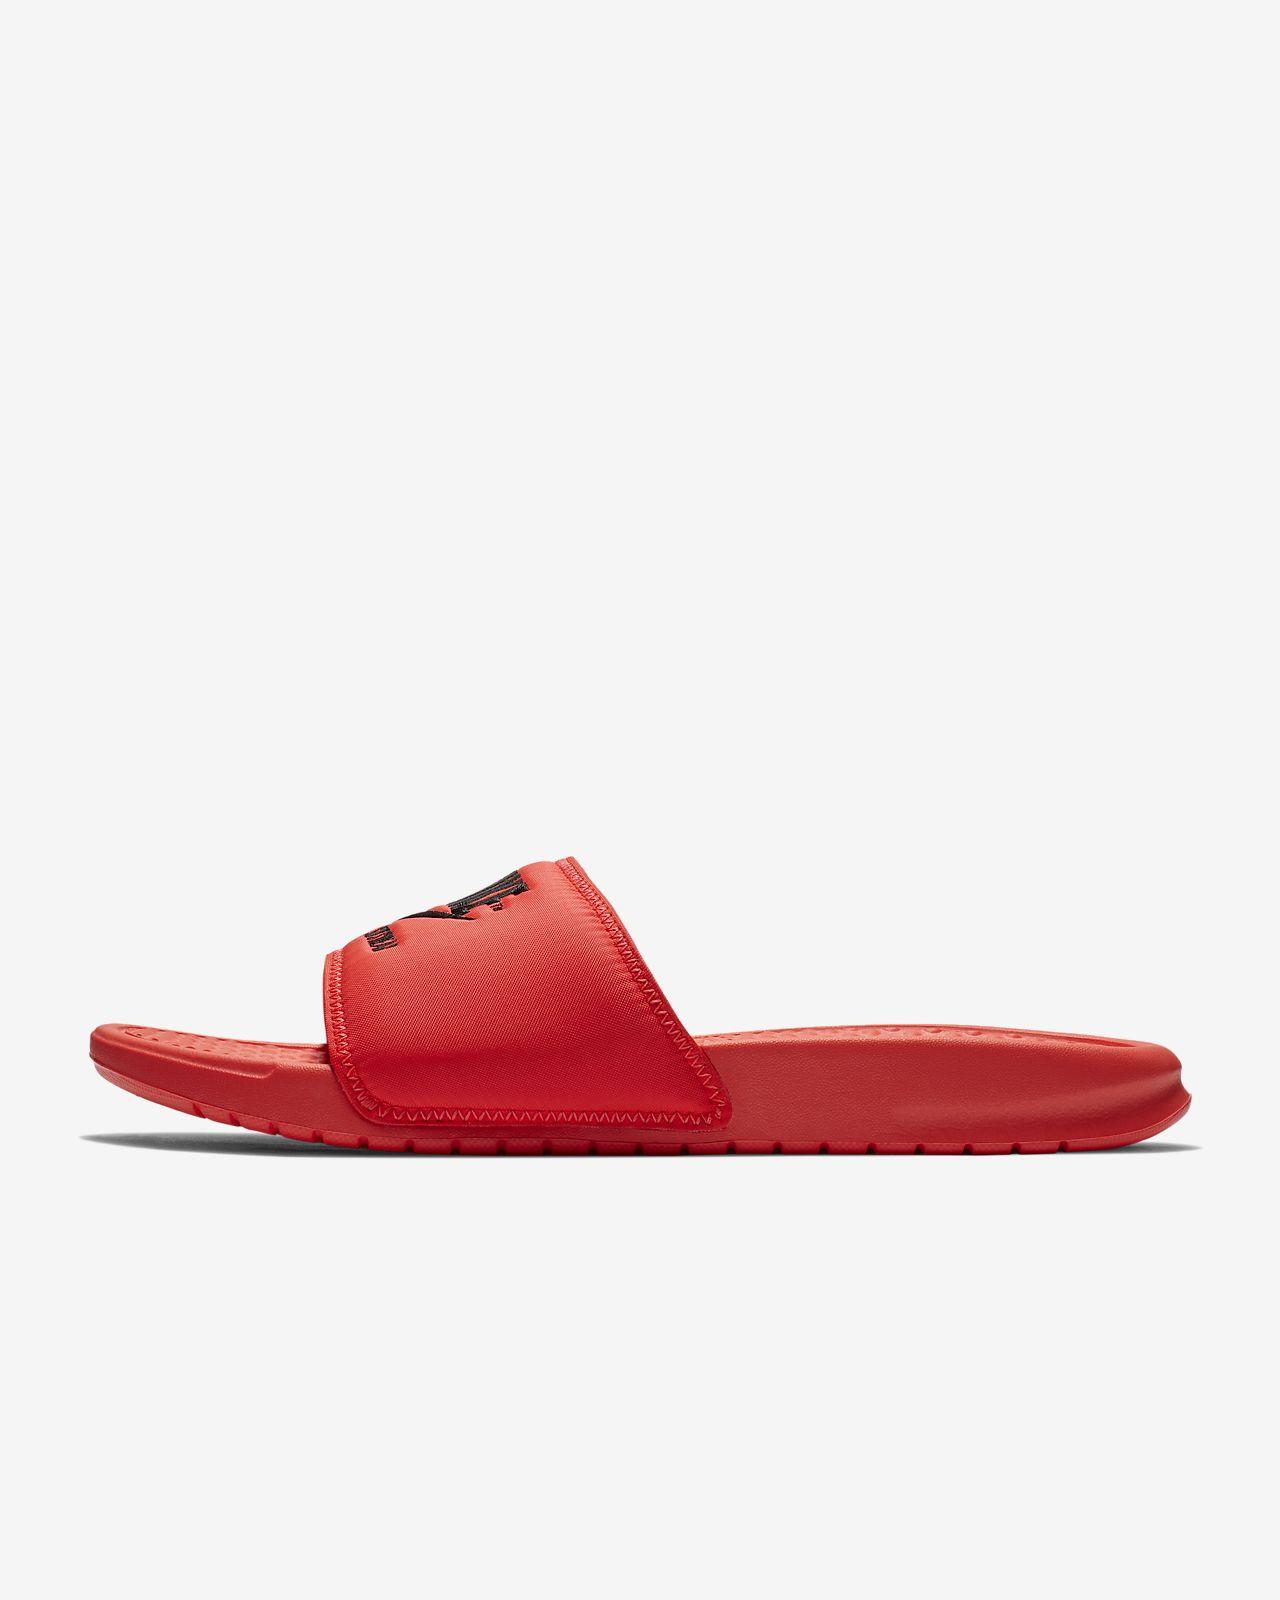 44ae6275116c Nike Benassi JDI TXT SE Men s Slide. Nike.com ZA